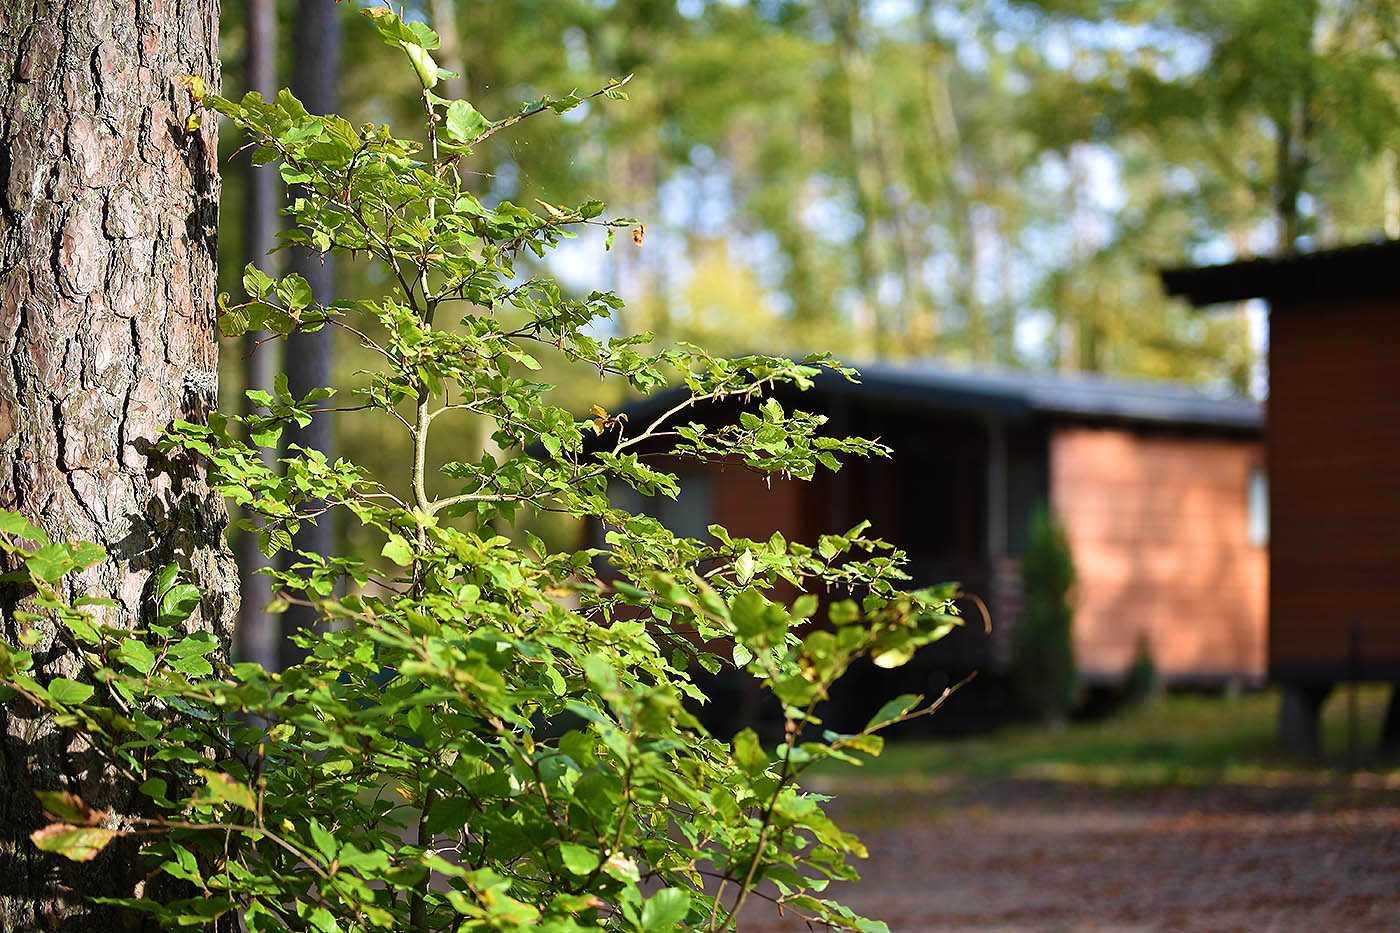 domki letniskowe kaszuby siedlisko bartek63